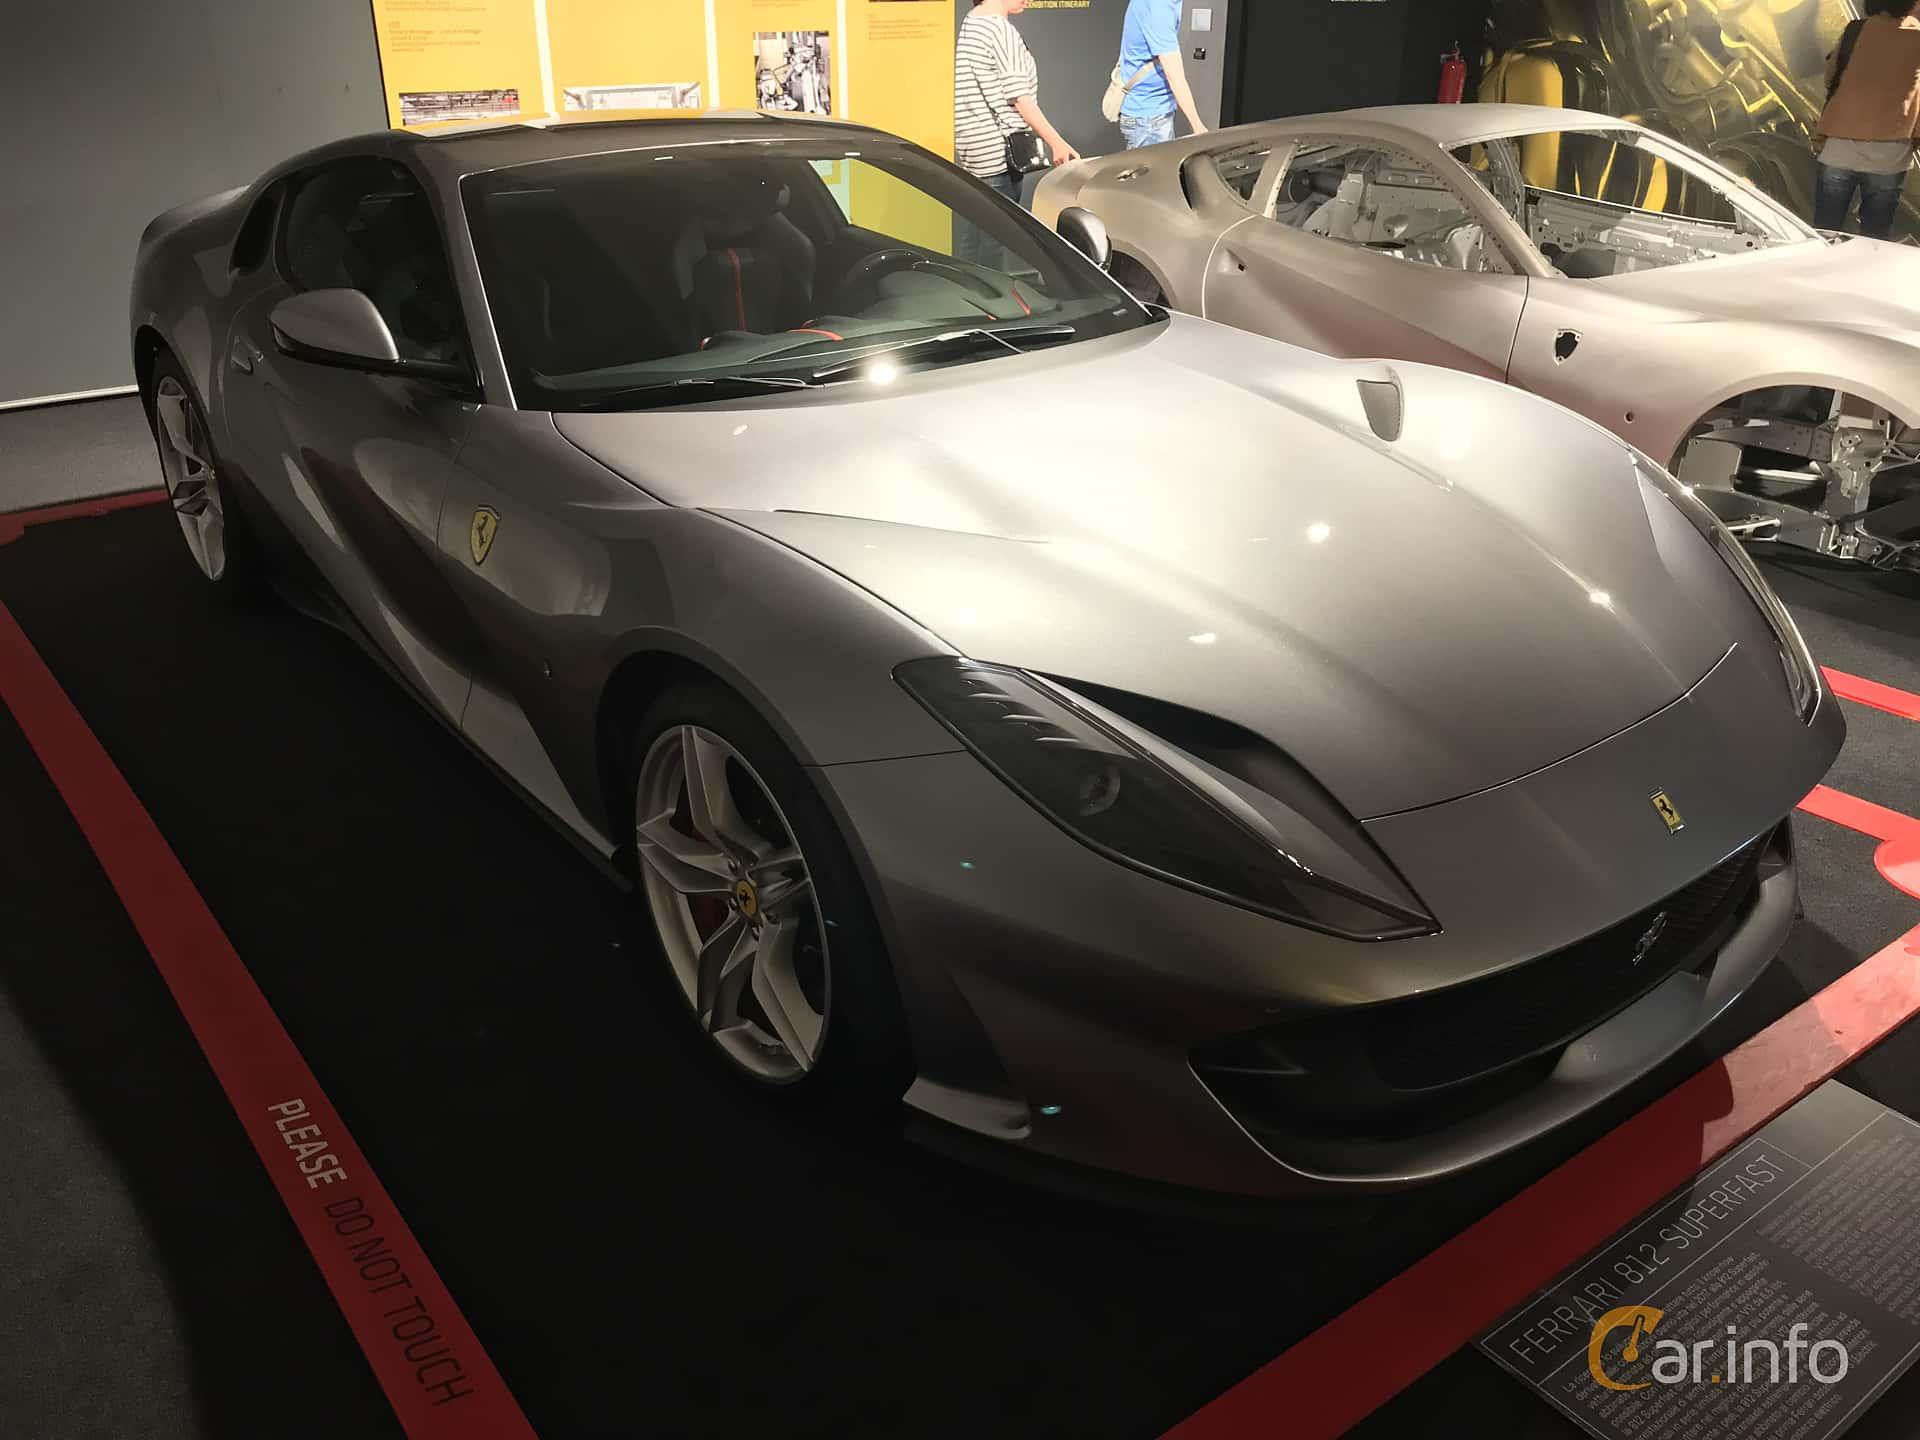 Ferrari 812 Superfast 6.5 V12 DCT, 800hp, 2018